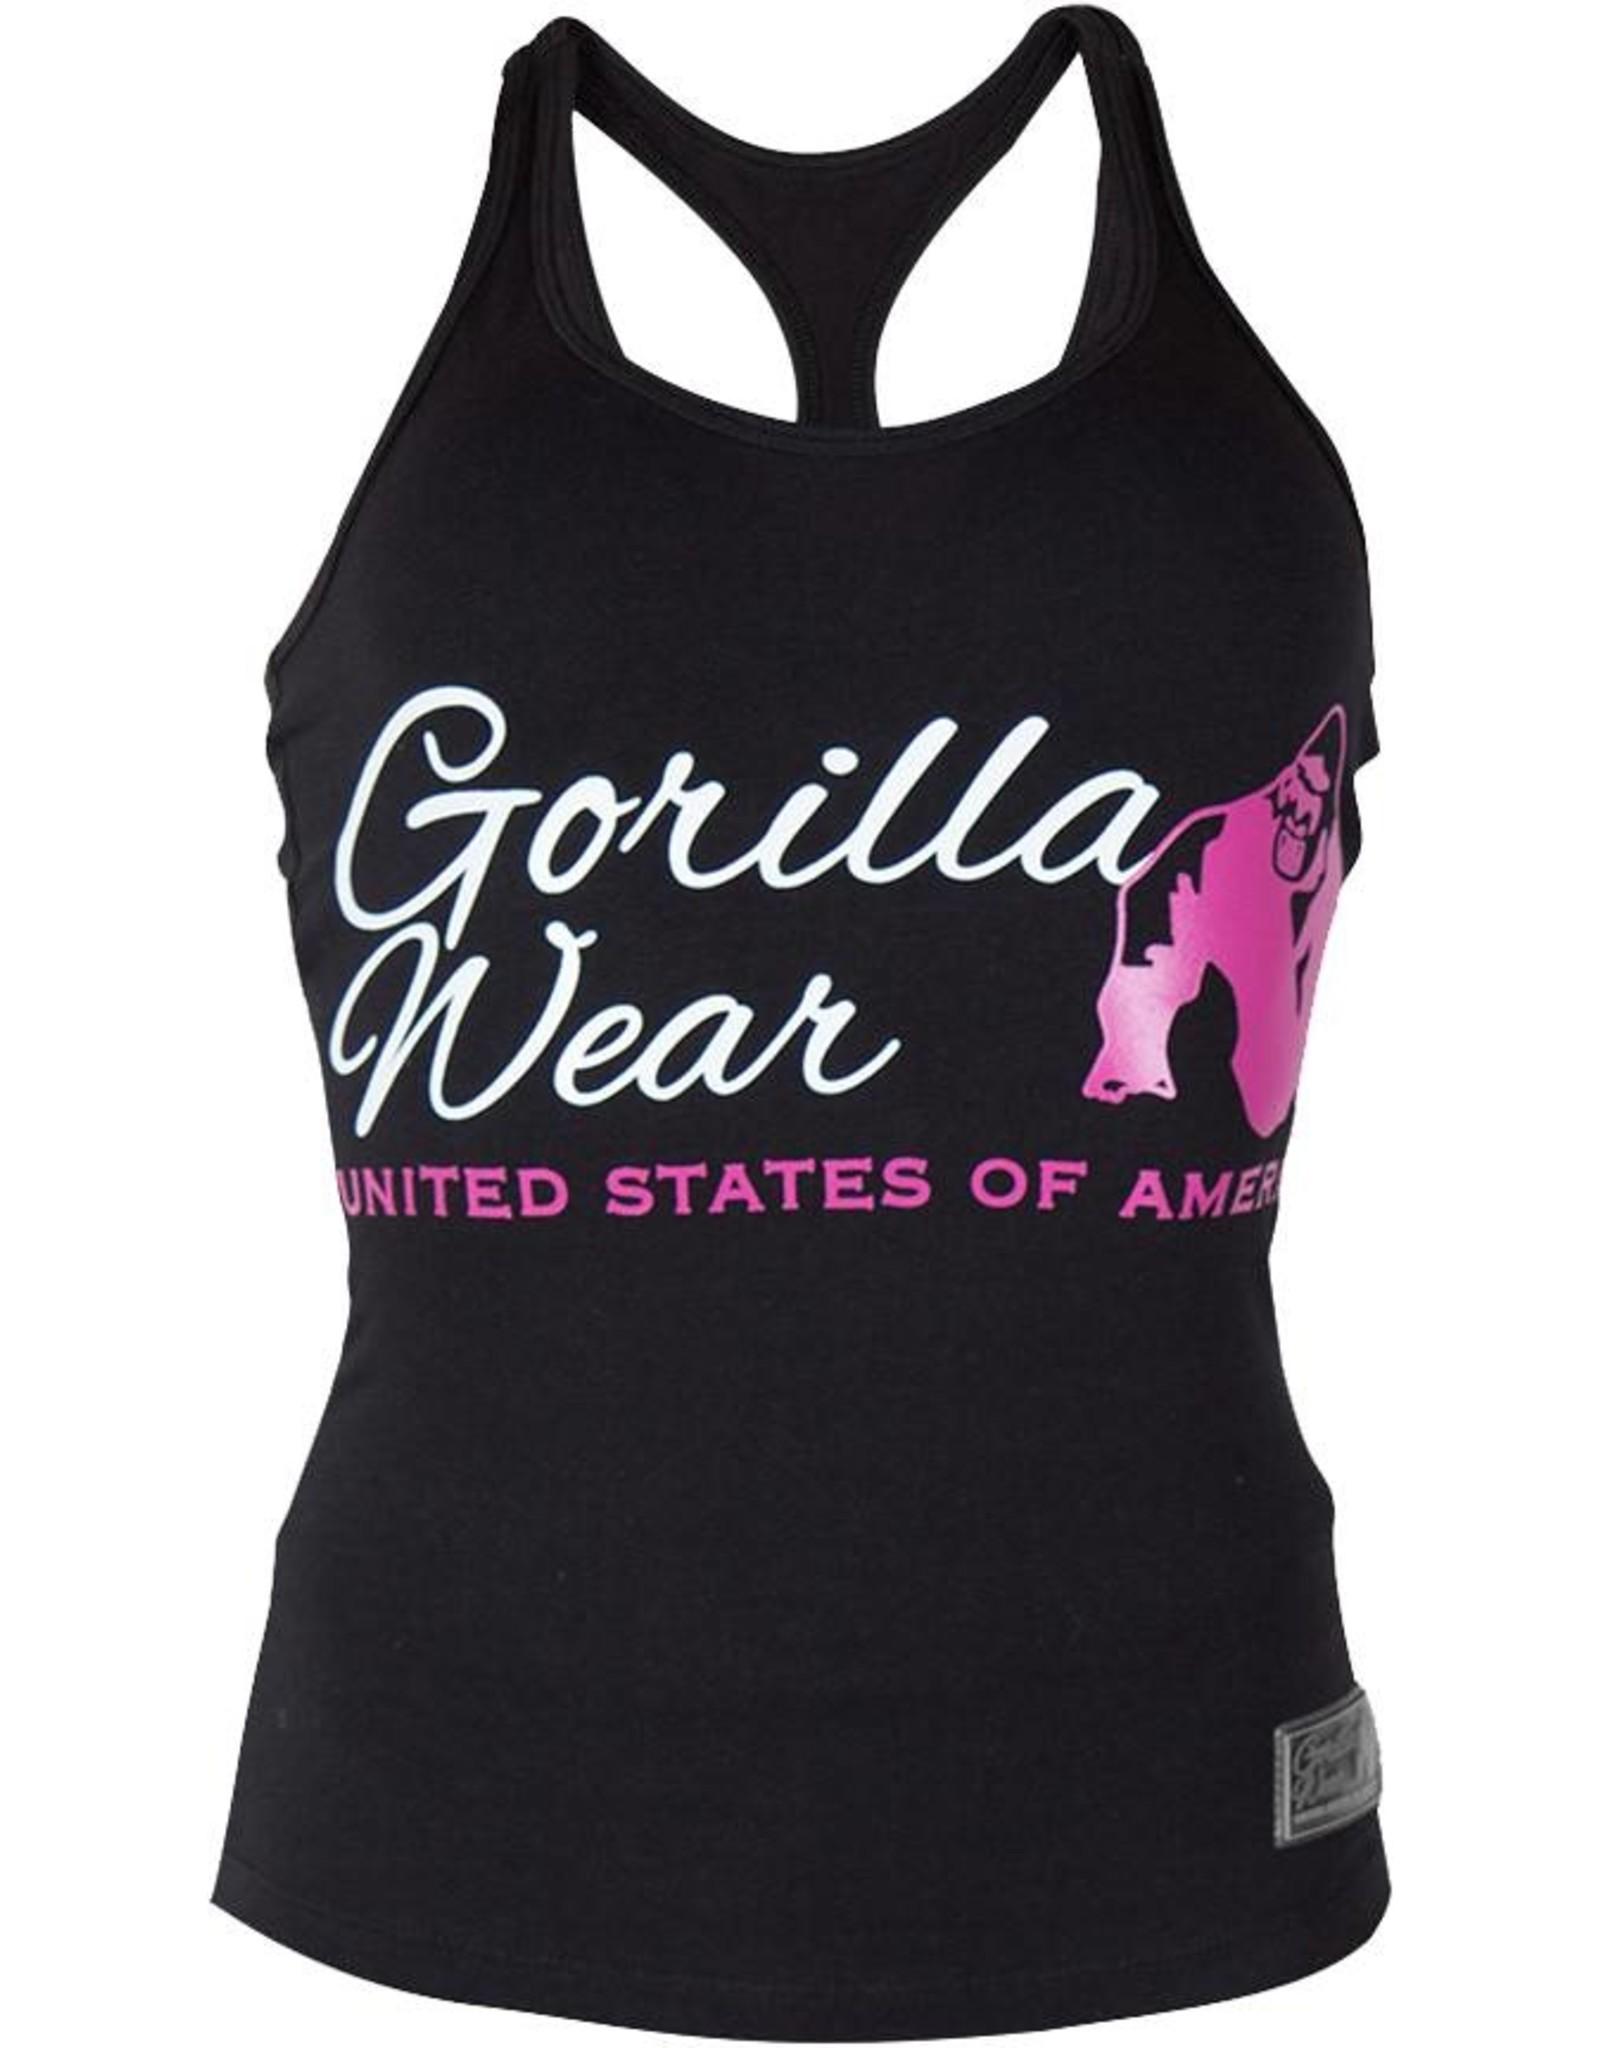 Gorilla Wear Ladies Classic Tank Top - Black